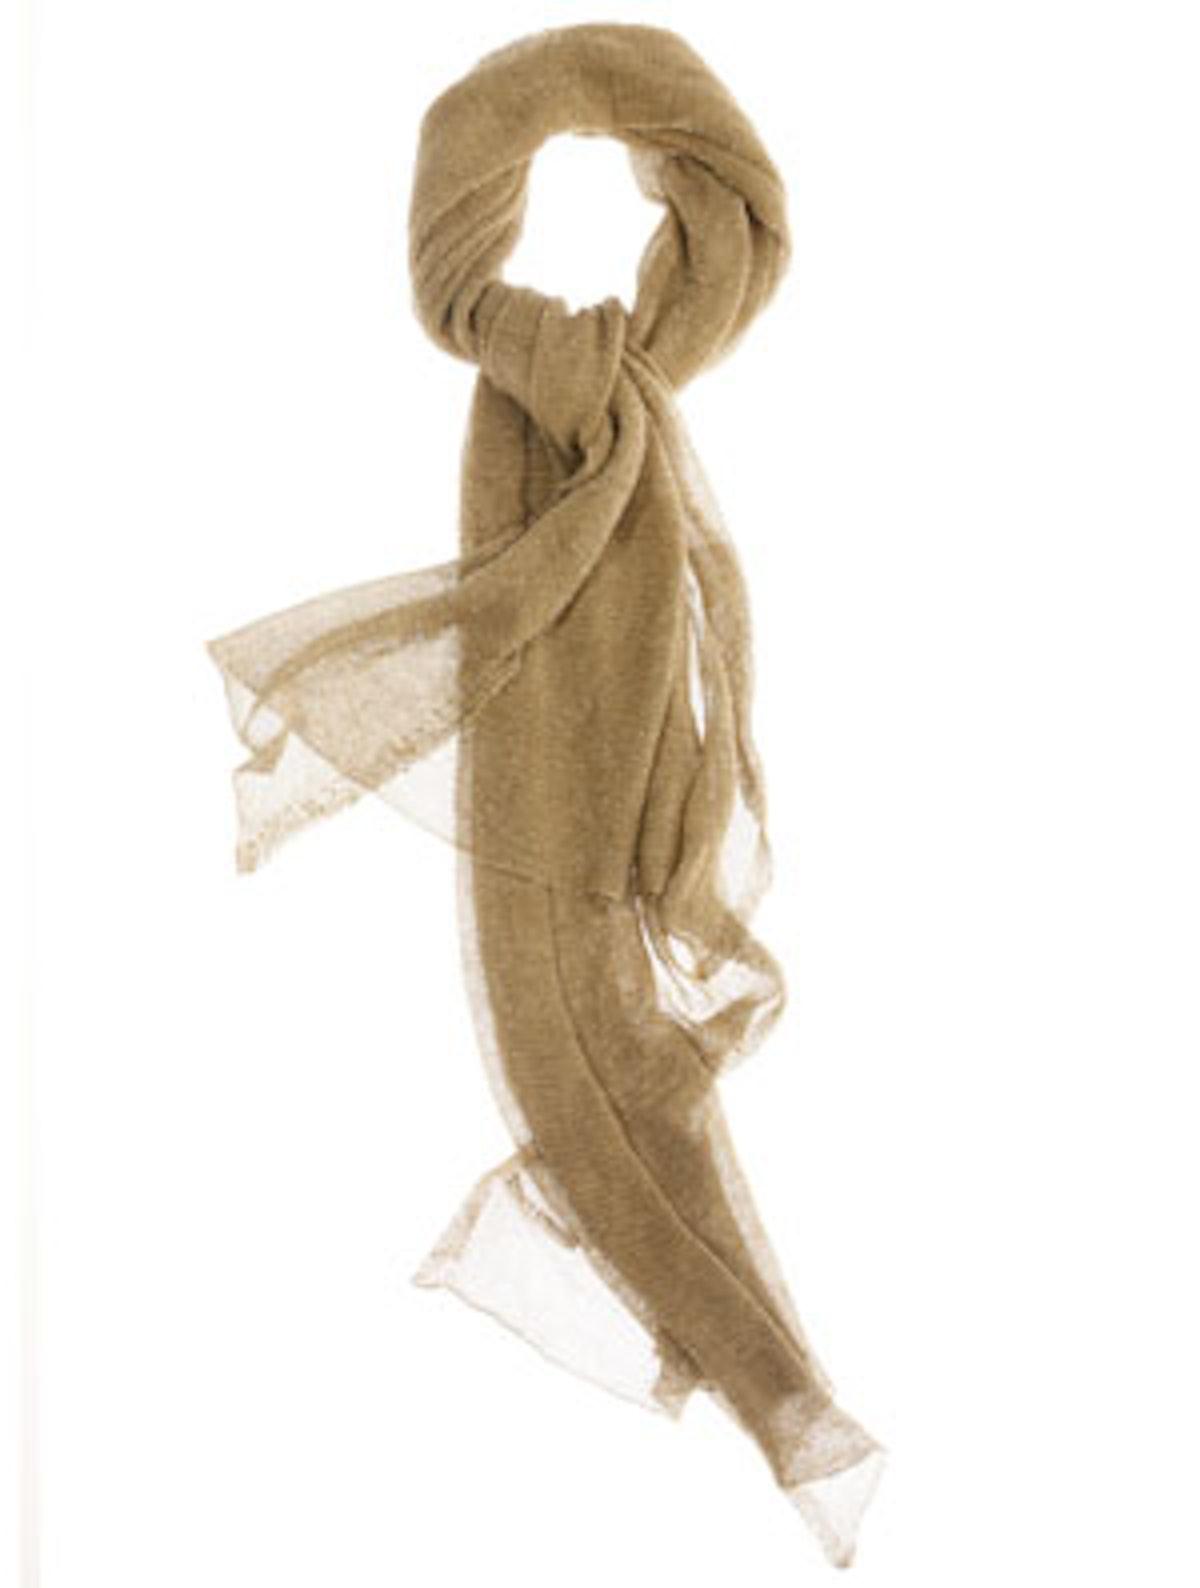 acss_scarves_02_v.jpg